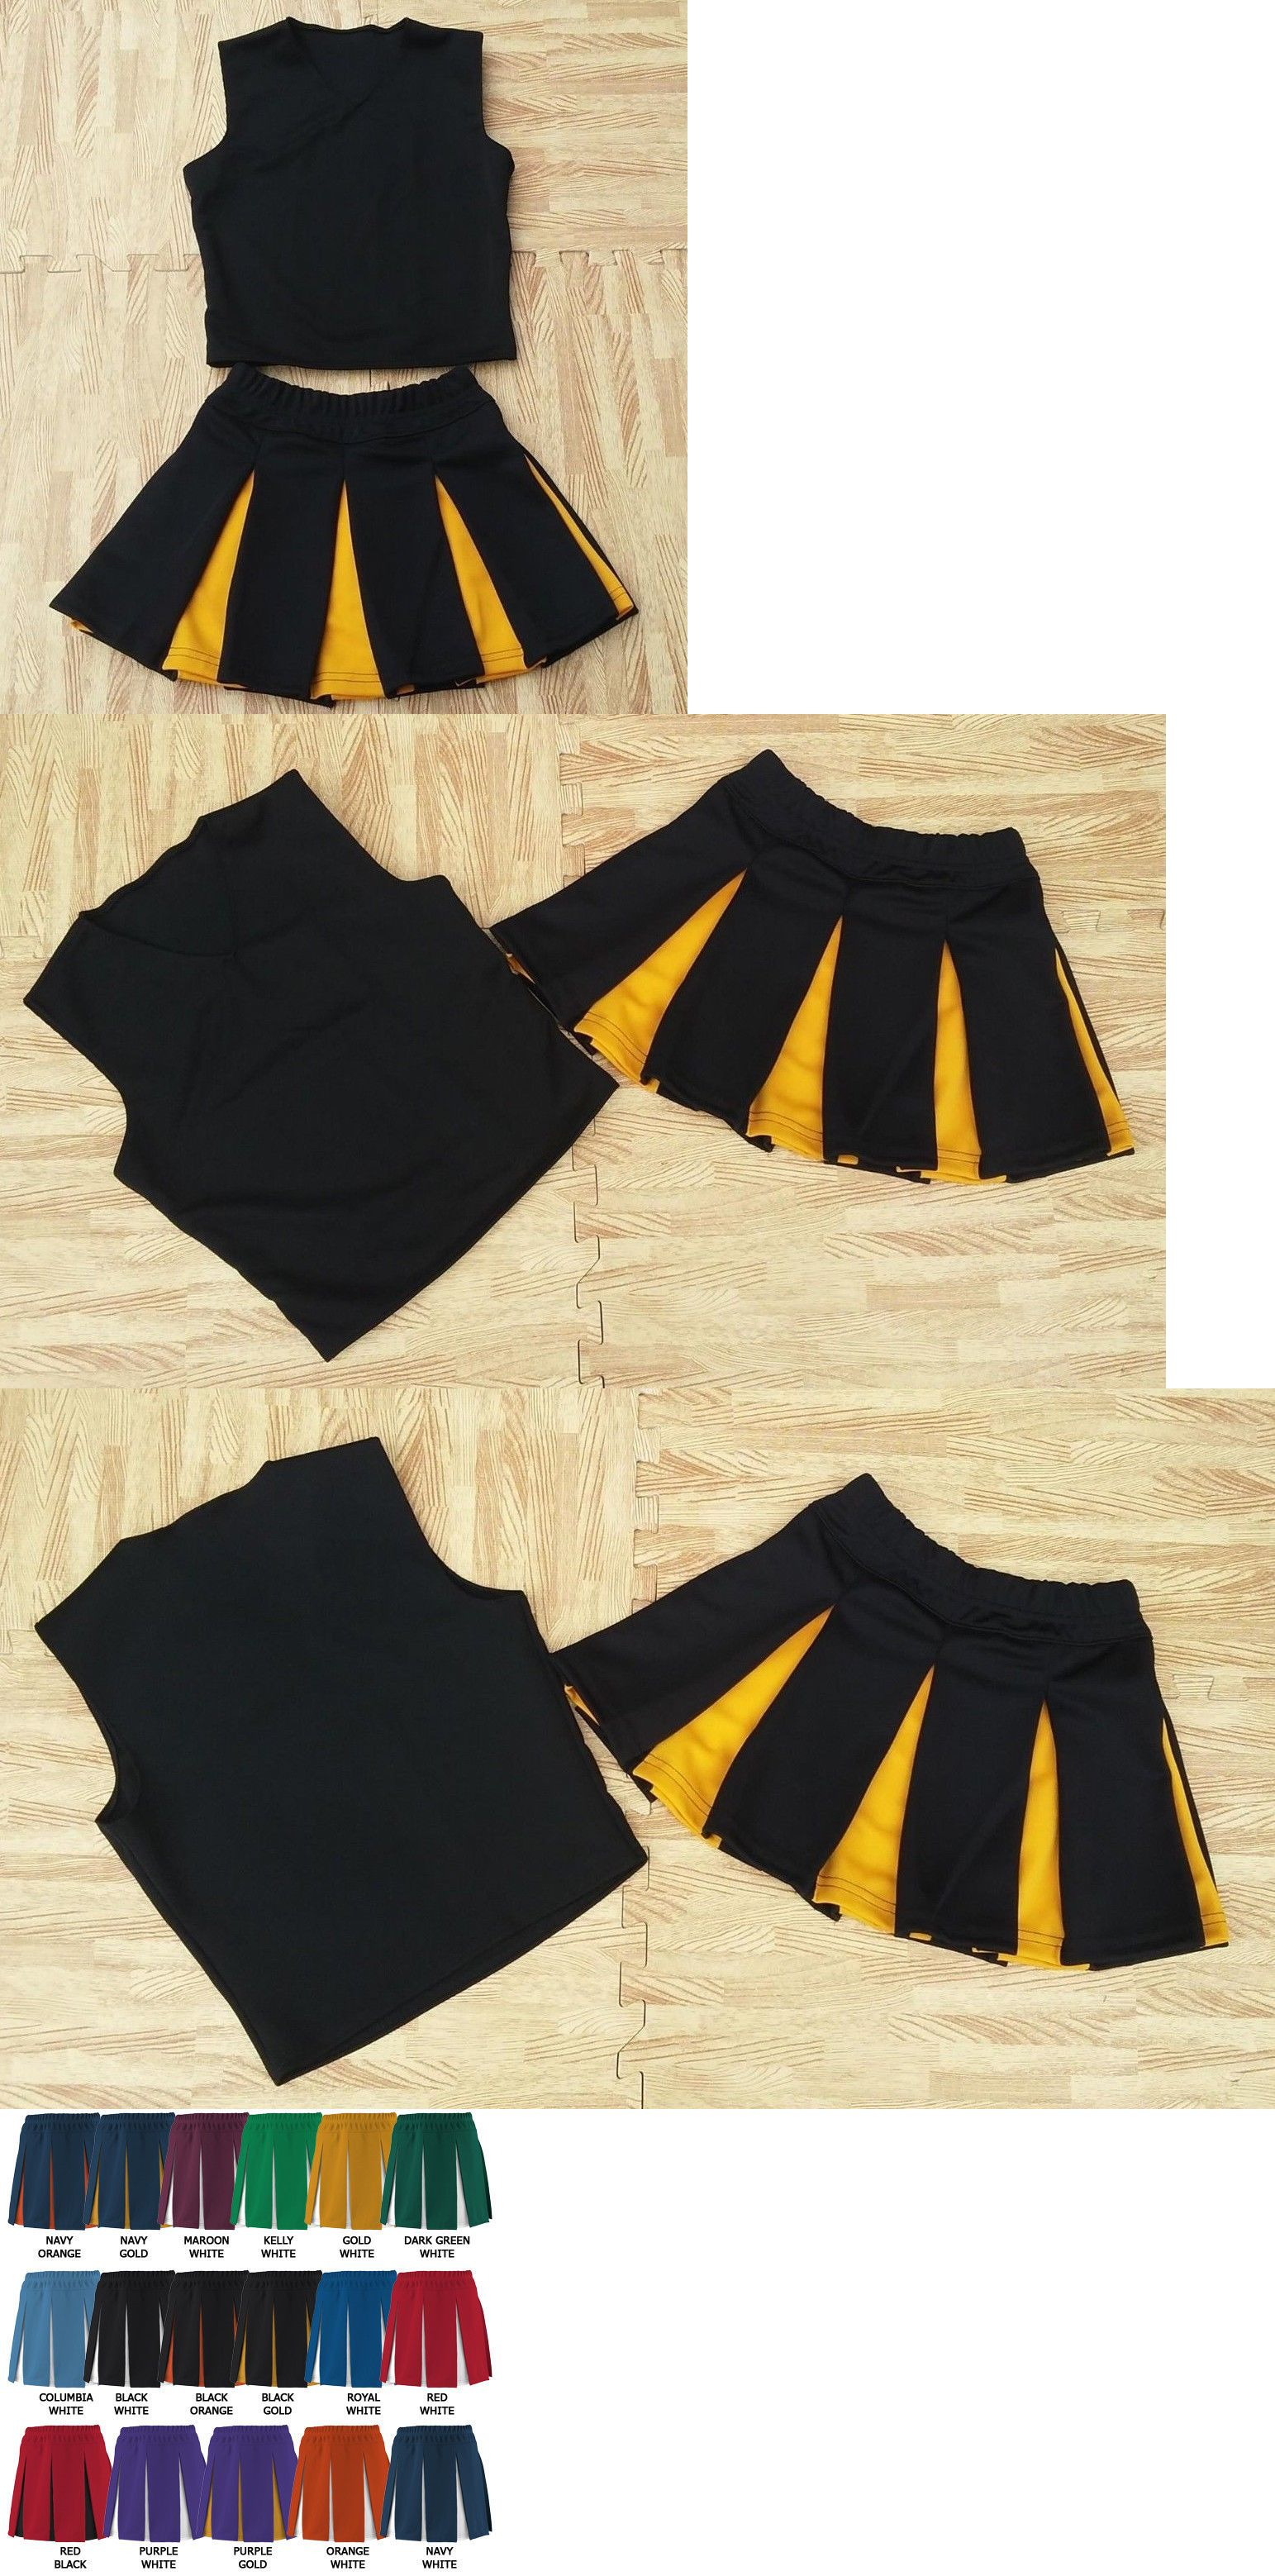 7f8a2bd8c4e Cheerleading 66832  Girl M L Black Real Cheerleader Uniform Top Skirt 28-31  22-24 Steelers Hornets -  BUY IT NOW ONLY   24.99 on  eBay  cheerleading   black ...